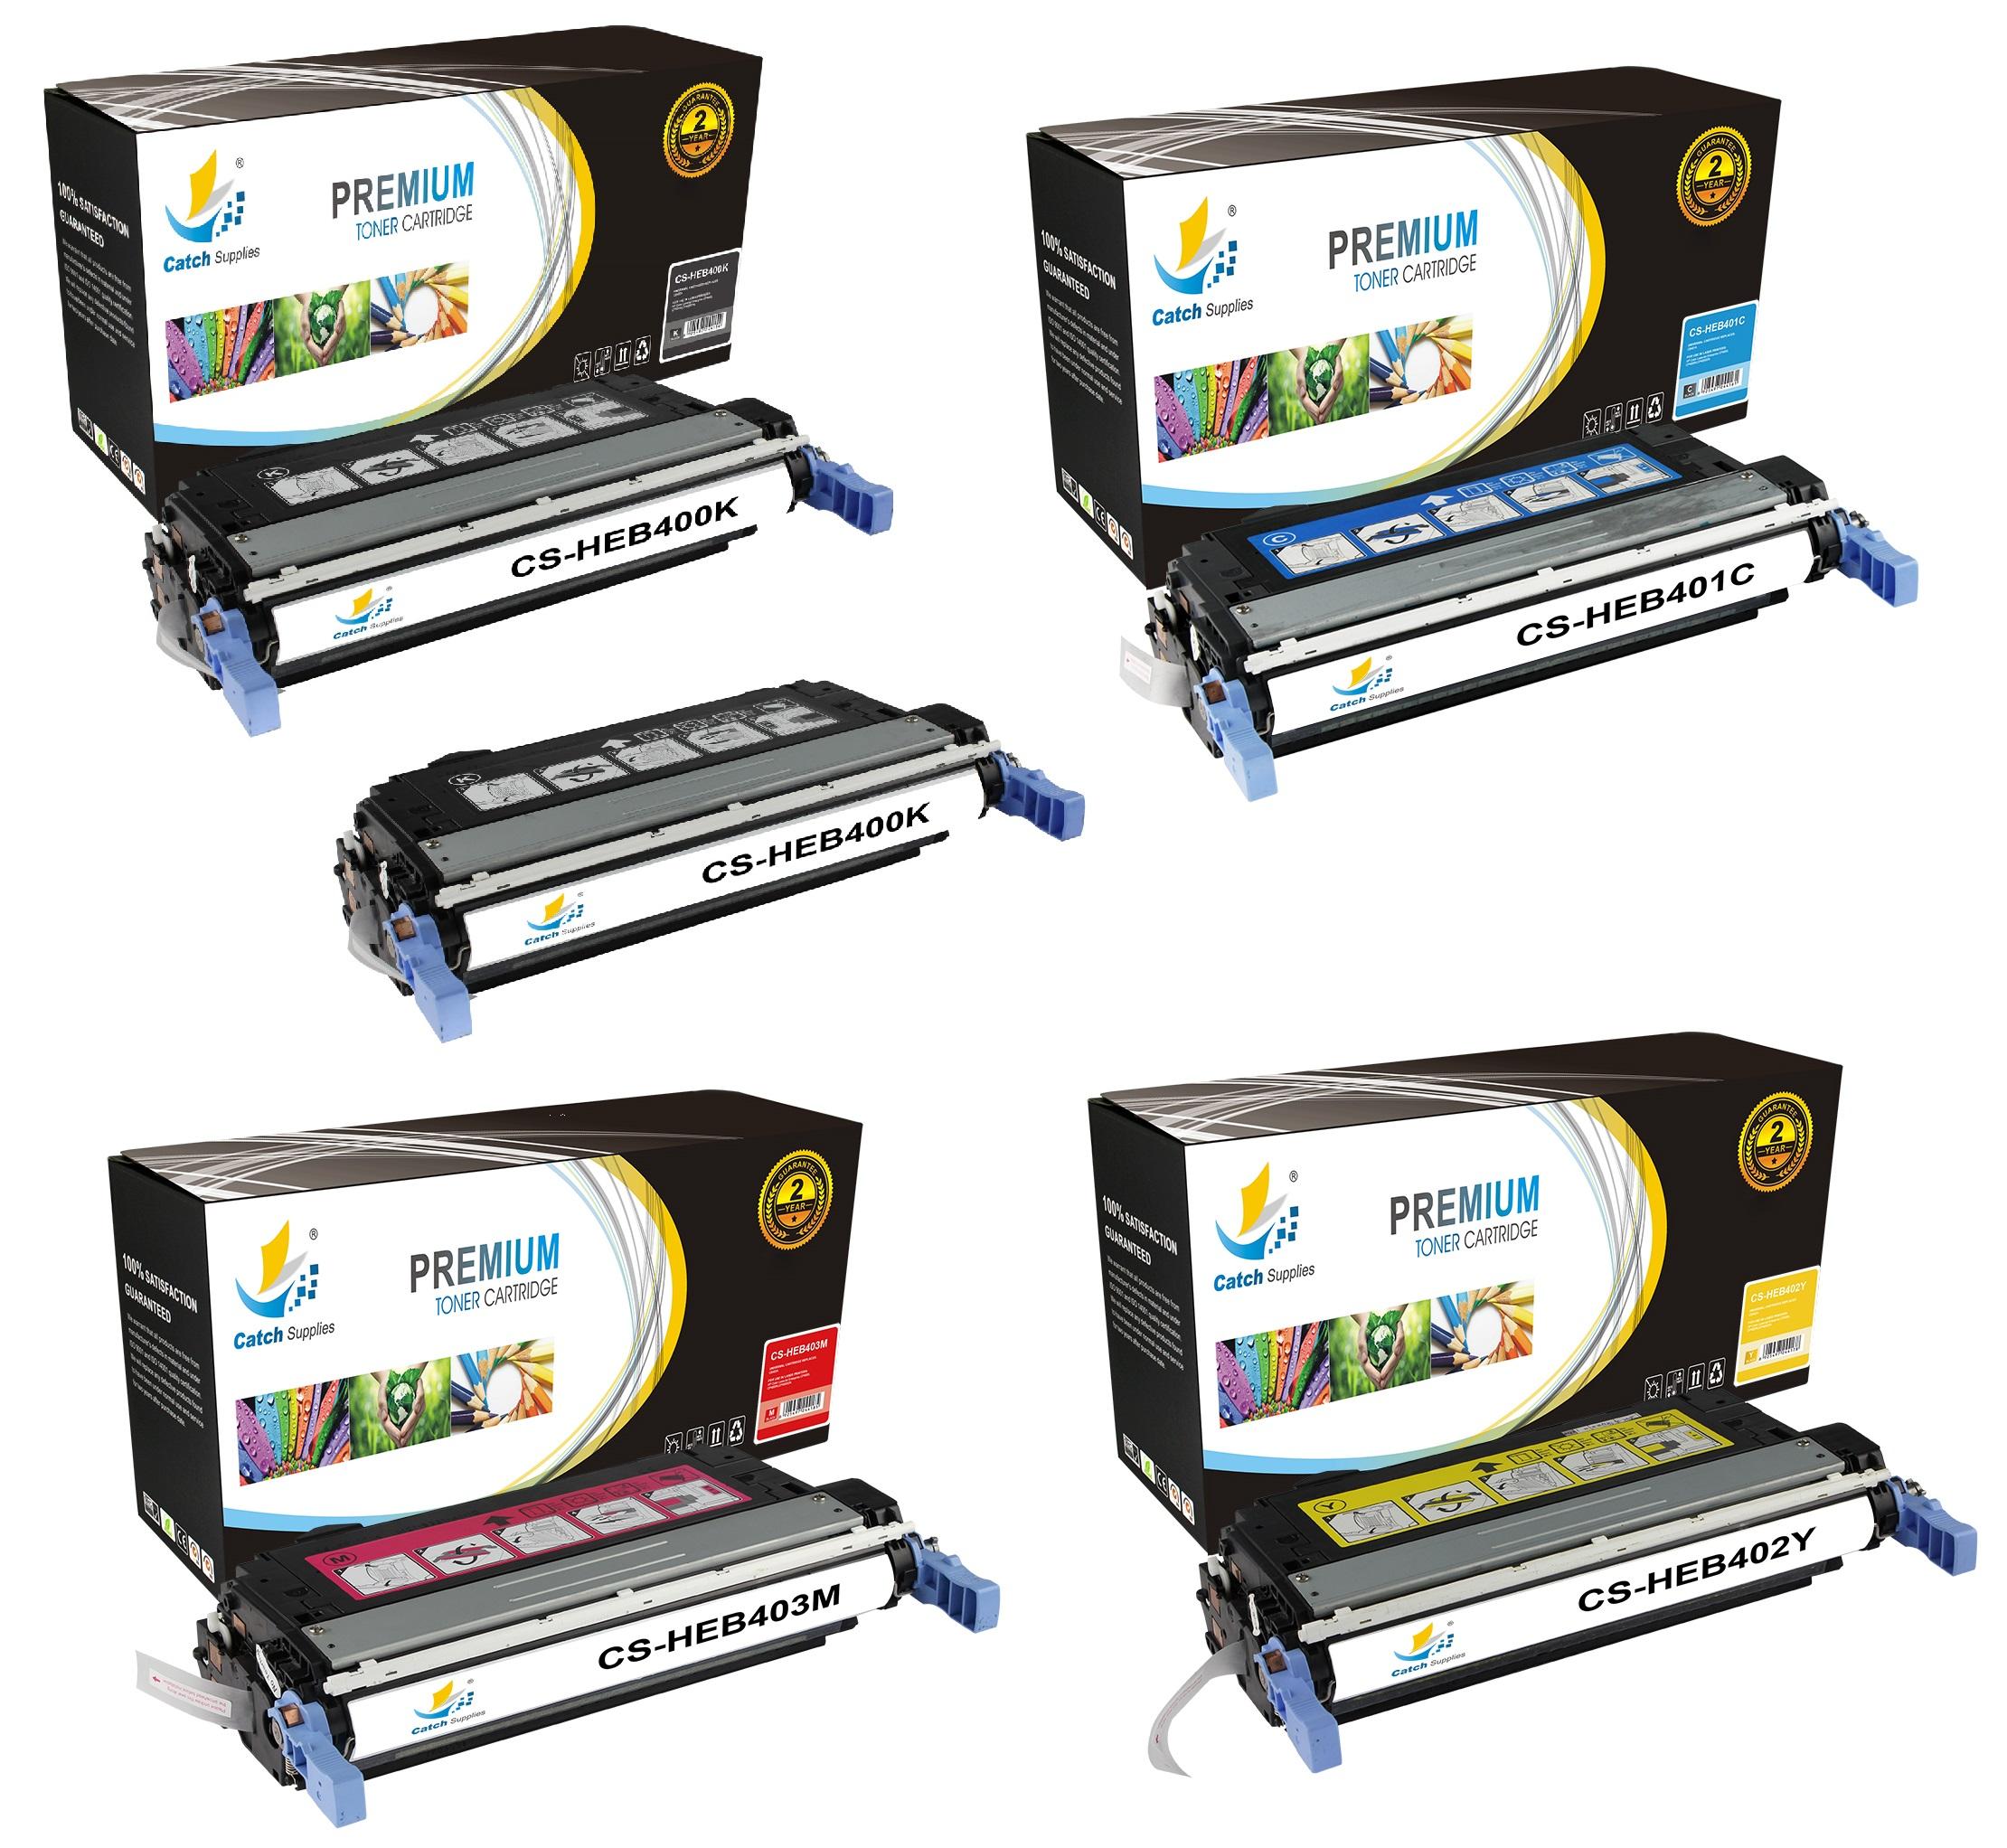 Catch Supplies 642a 5 Pack Premium Cb400a Cb401a Cb402a Cb403a Hp Color Laserjet Cp4005 Cyan Cartridge Replacement Toner Compatible With Enterprise Cp4005n